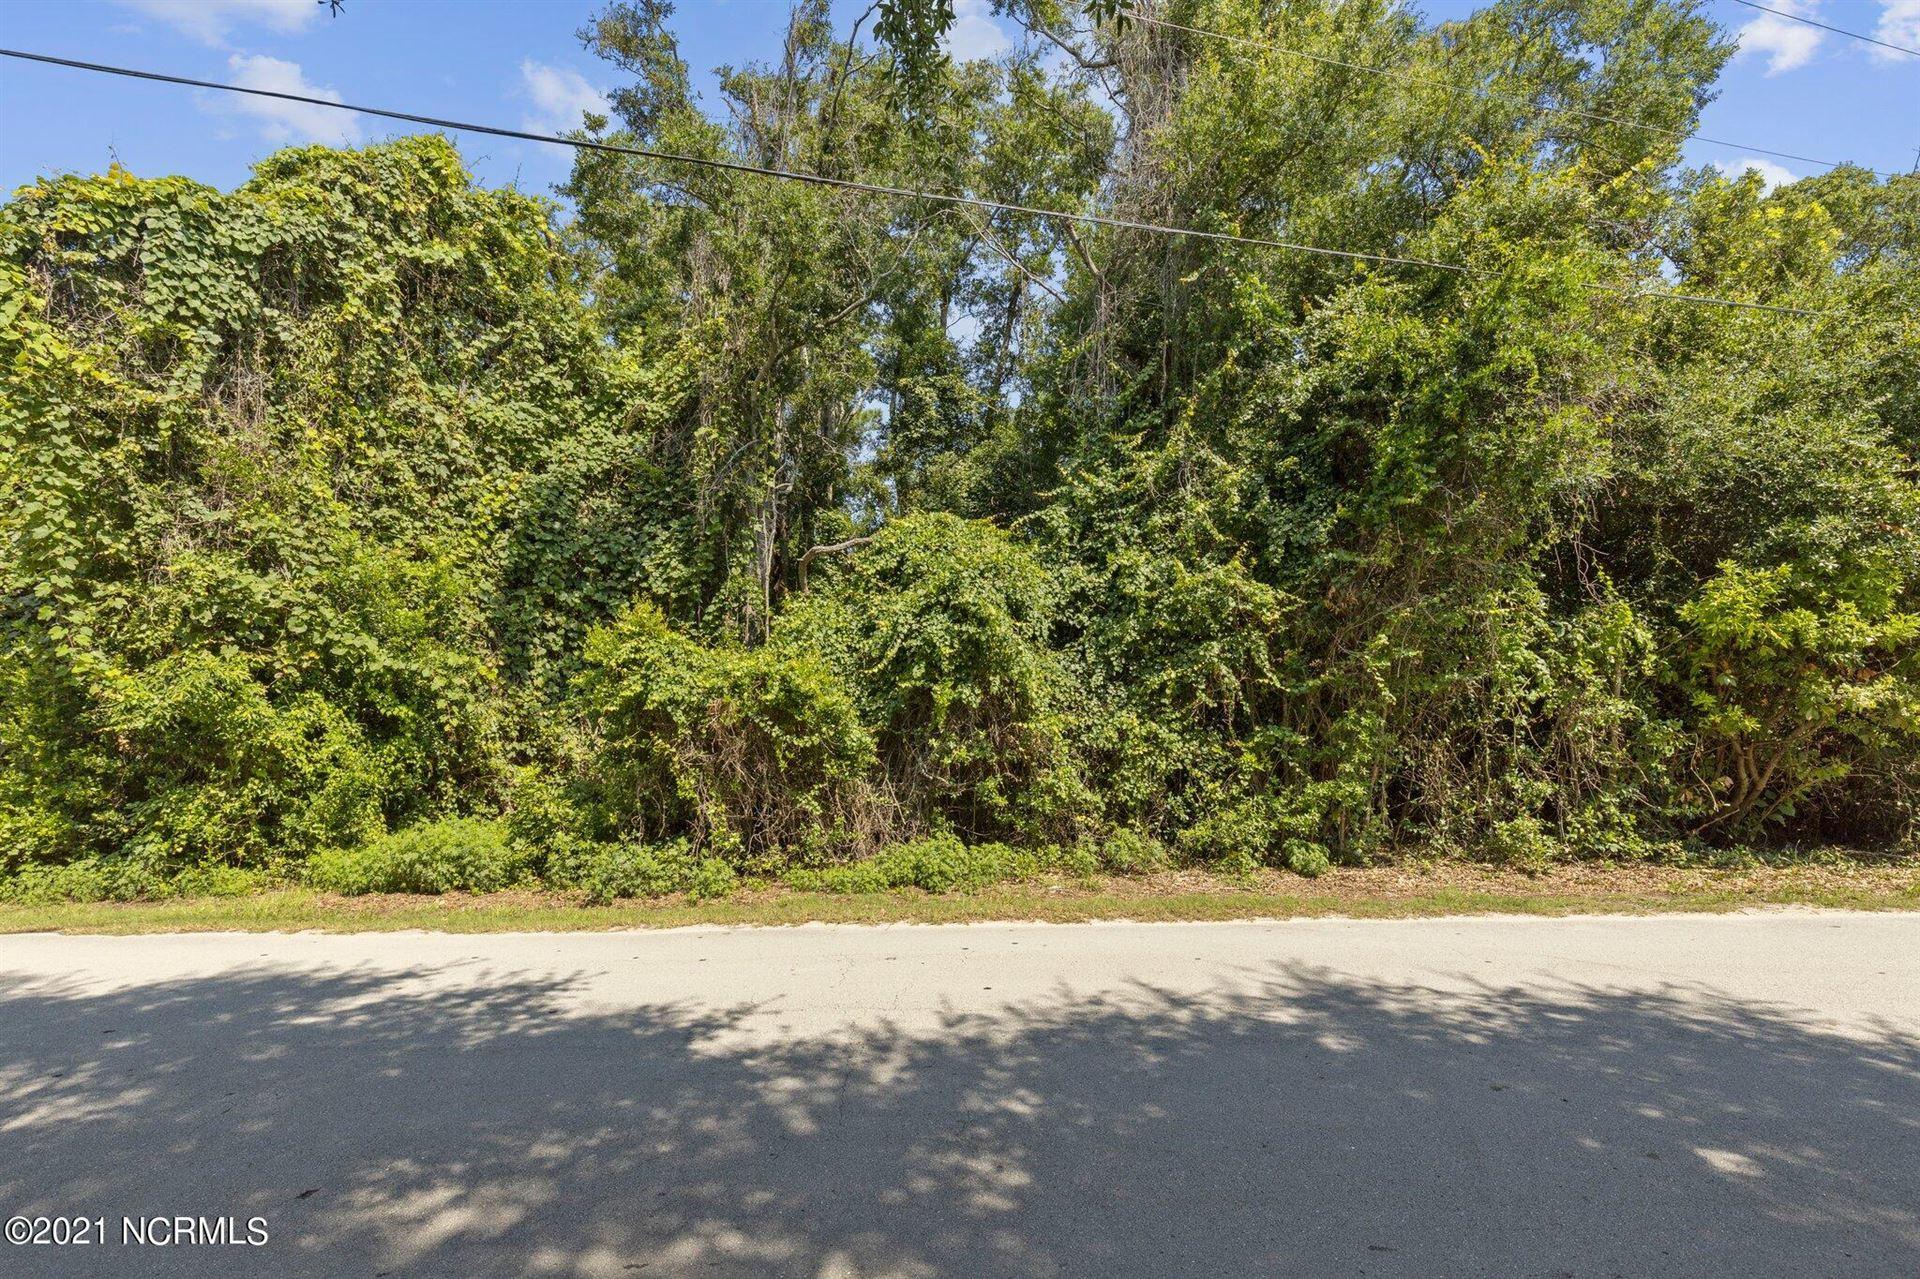 Photo of 7320 Archers Creek Drive, Emerald Isle, NC 28594 (MLS # 100286475)